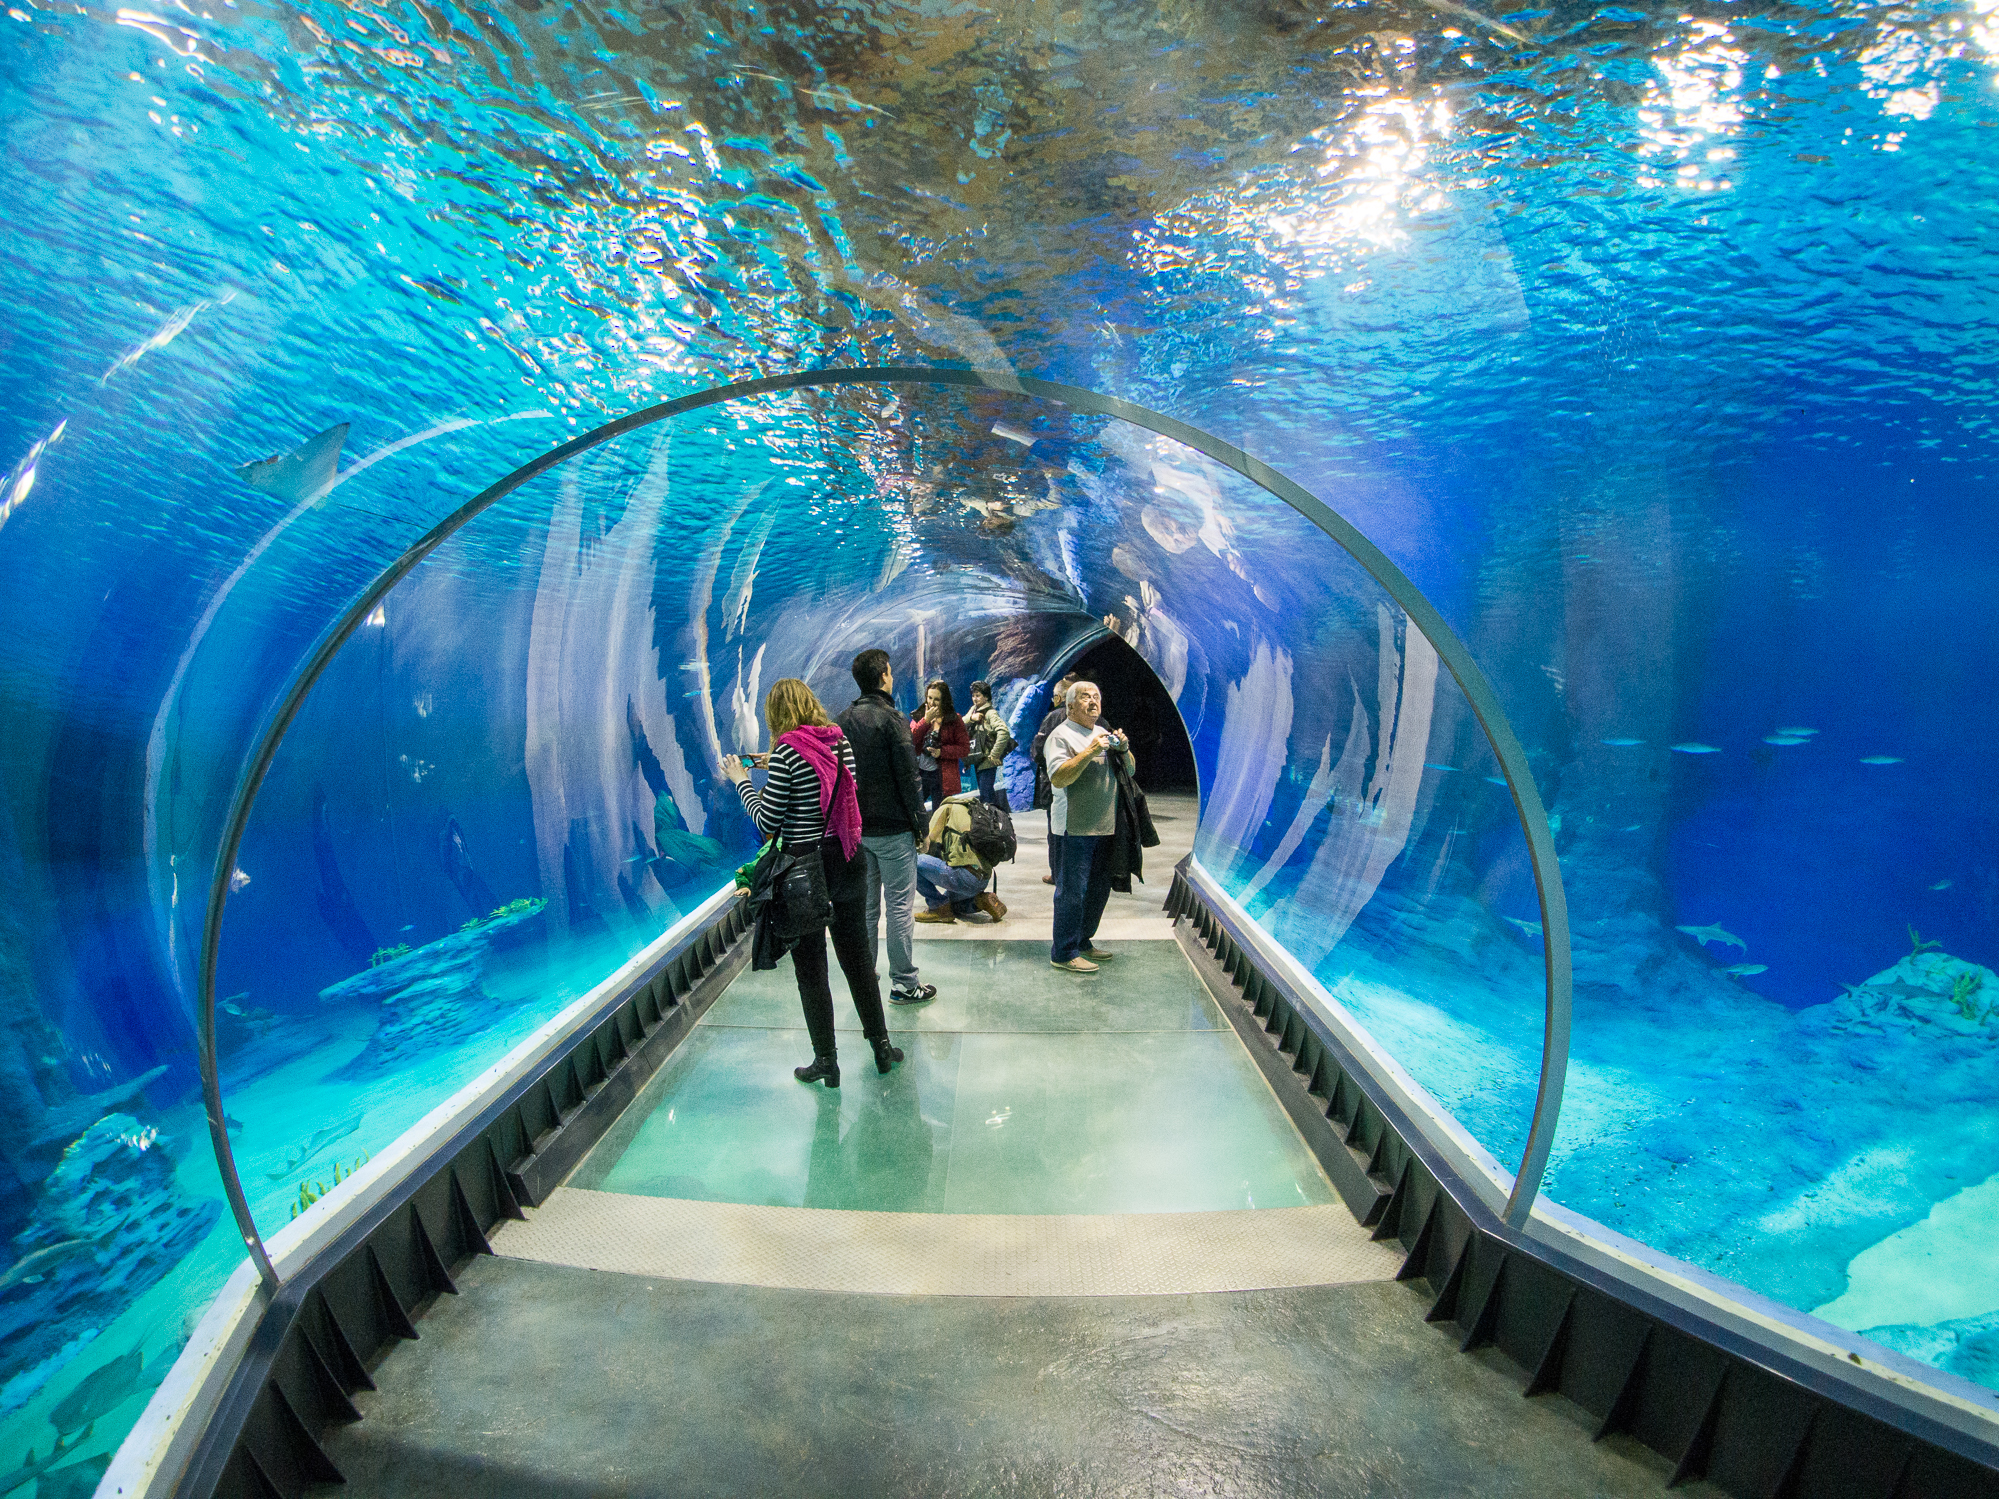 File:Afrykarium tunel.jpg - Wikimedia Commons